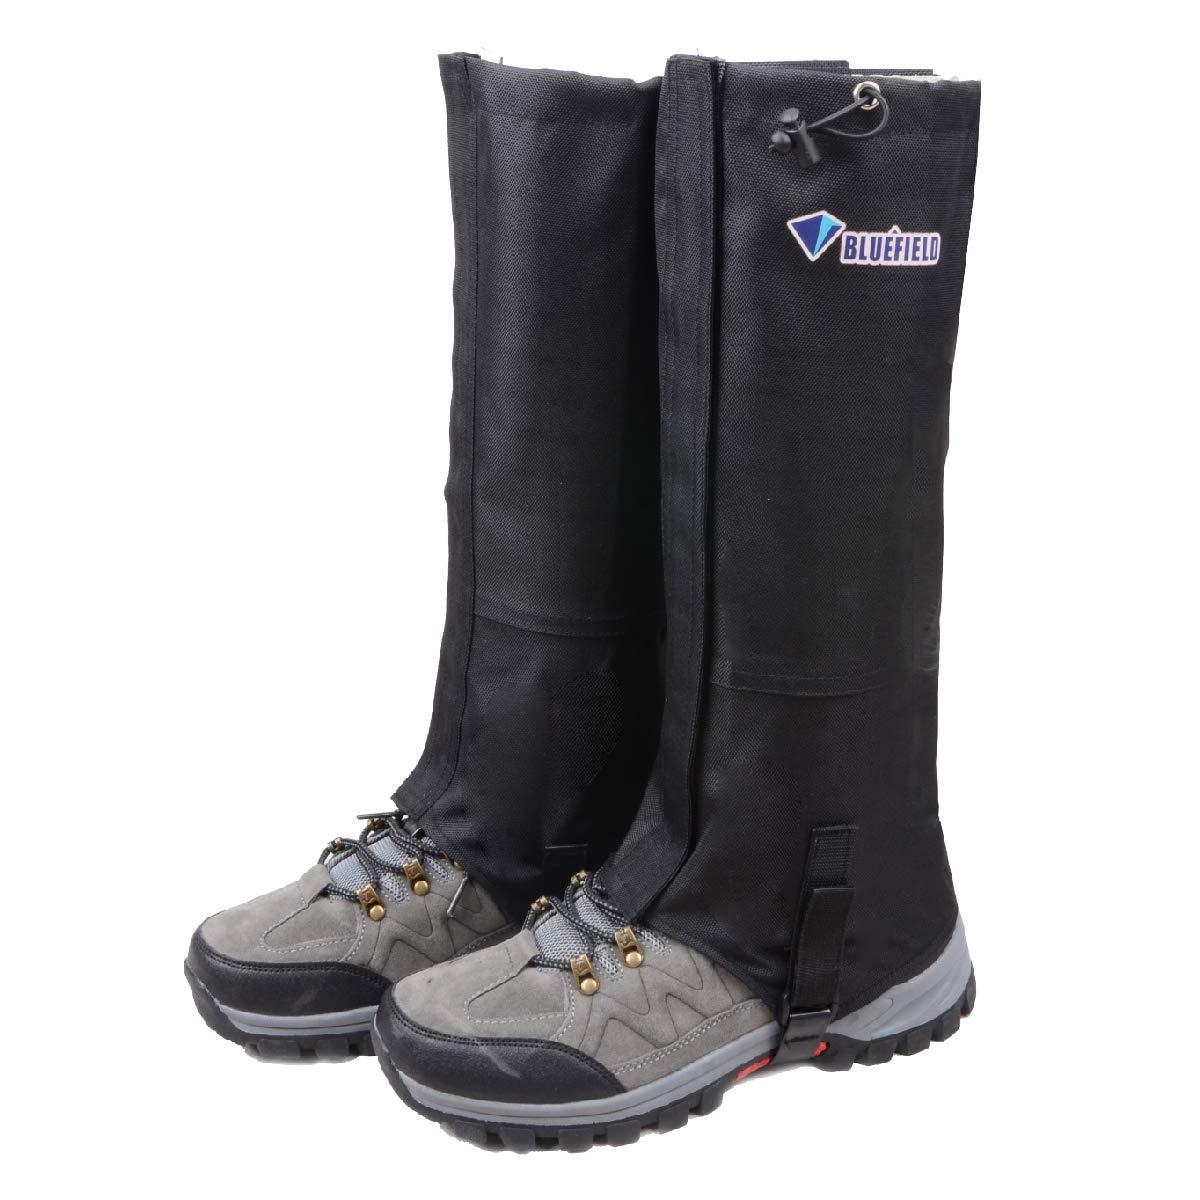 TRIWONDER Gators for Hiking Gaiters Waterproof Shoe Gaiters Rain Snow Boot Gators Men Women Outdoor Running Walking Climbing Hunting Backpacking Snowshoeing Lightweight Ankle Leg Gaiters 1 Pair